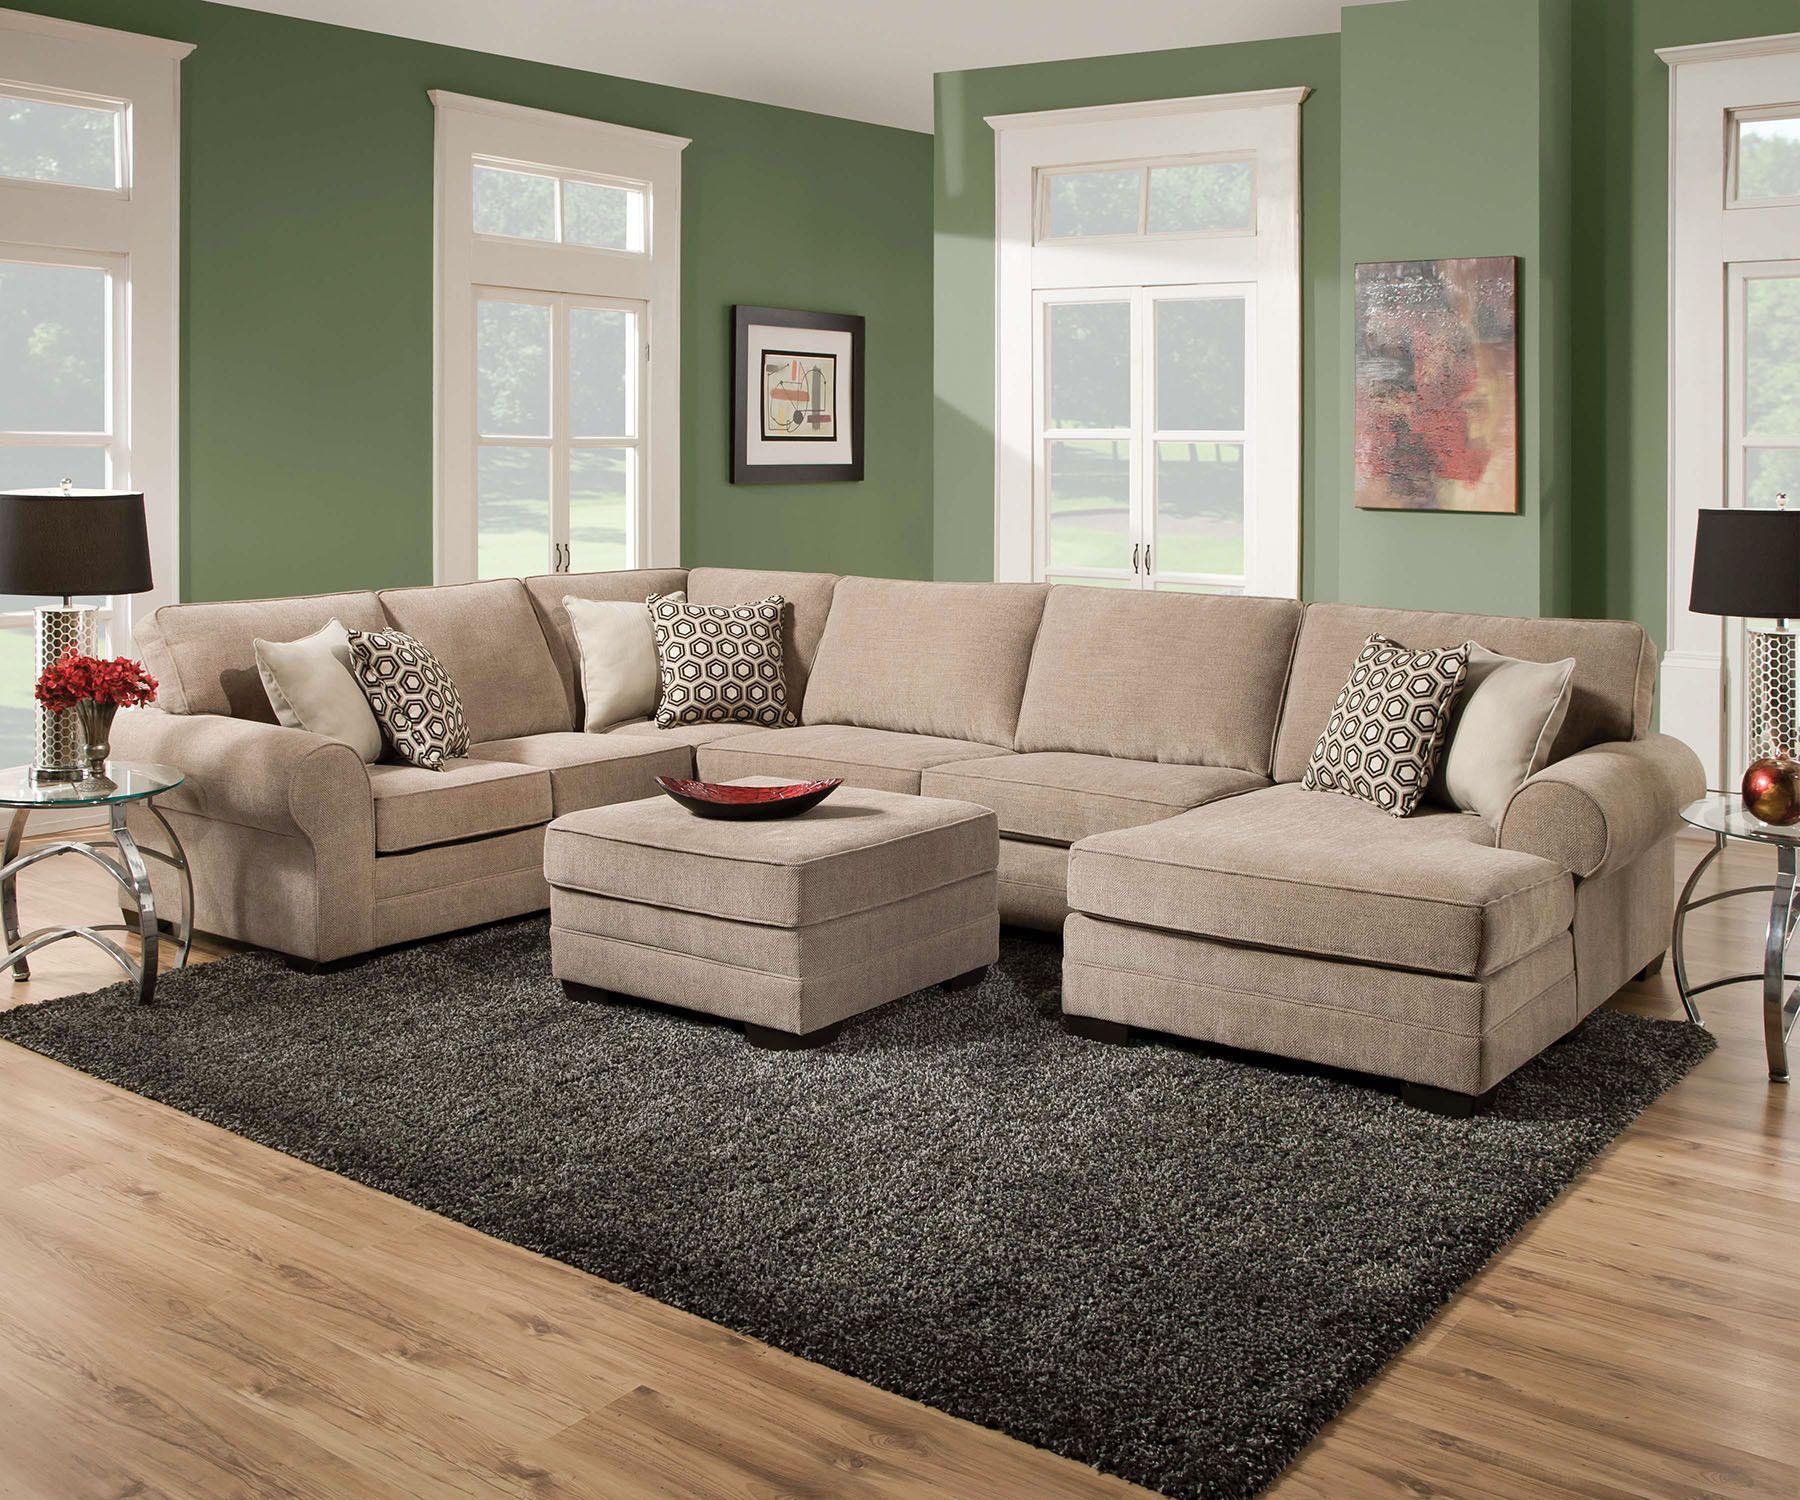 Sectional Sofas Modulares Decoracion De Interiores Salones Muebles Sala